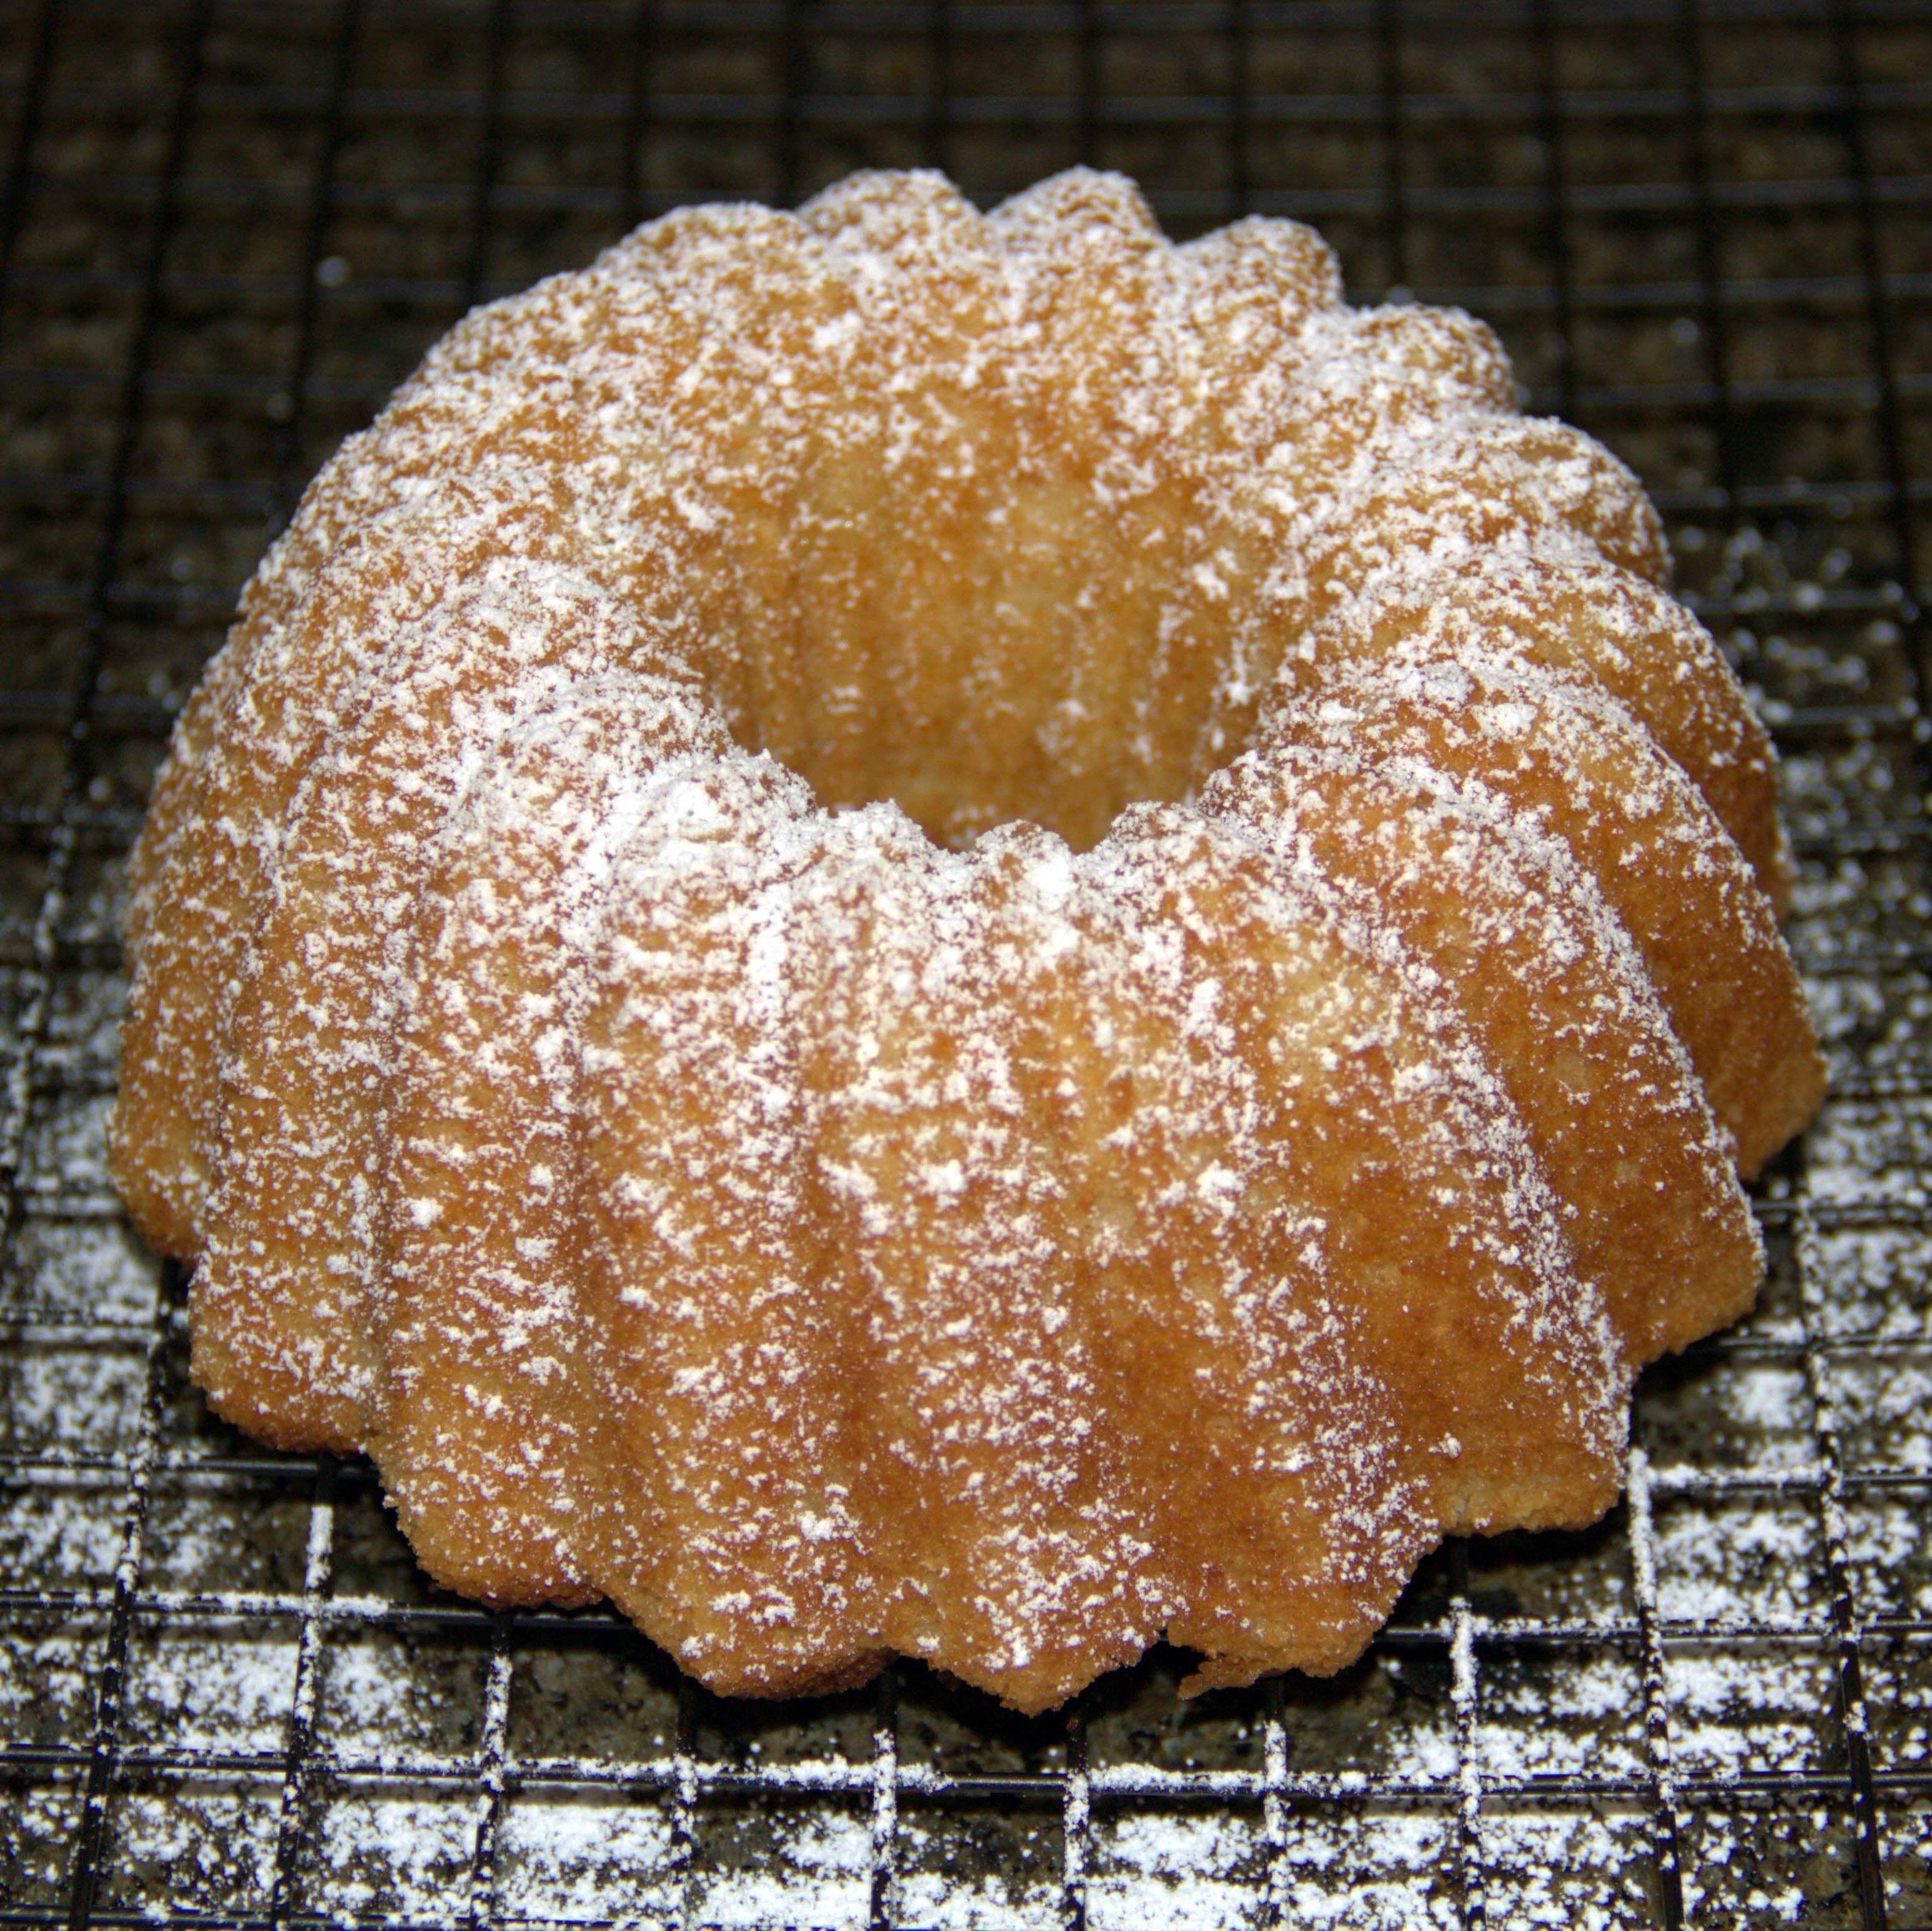 Air fryer cake Recipe Air fryer recipes, Food recipes